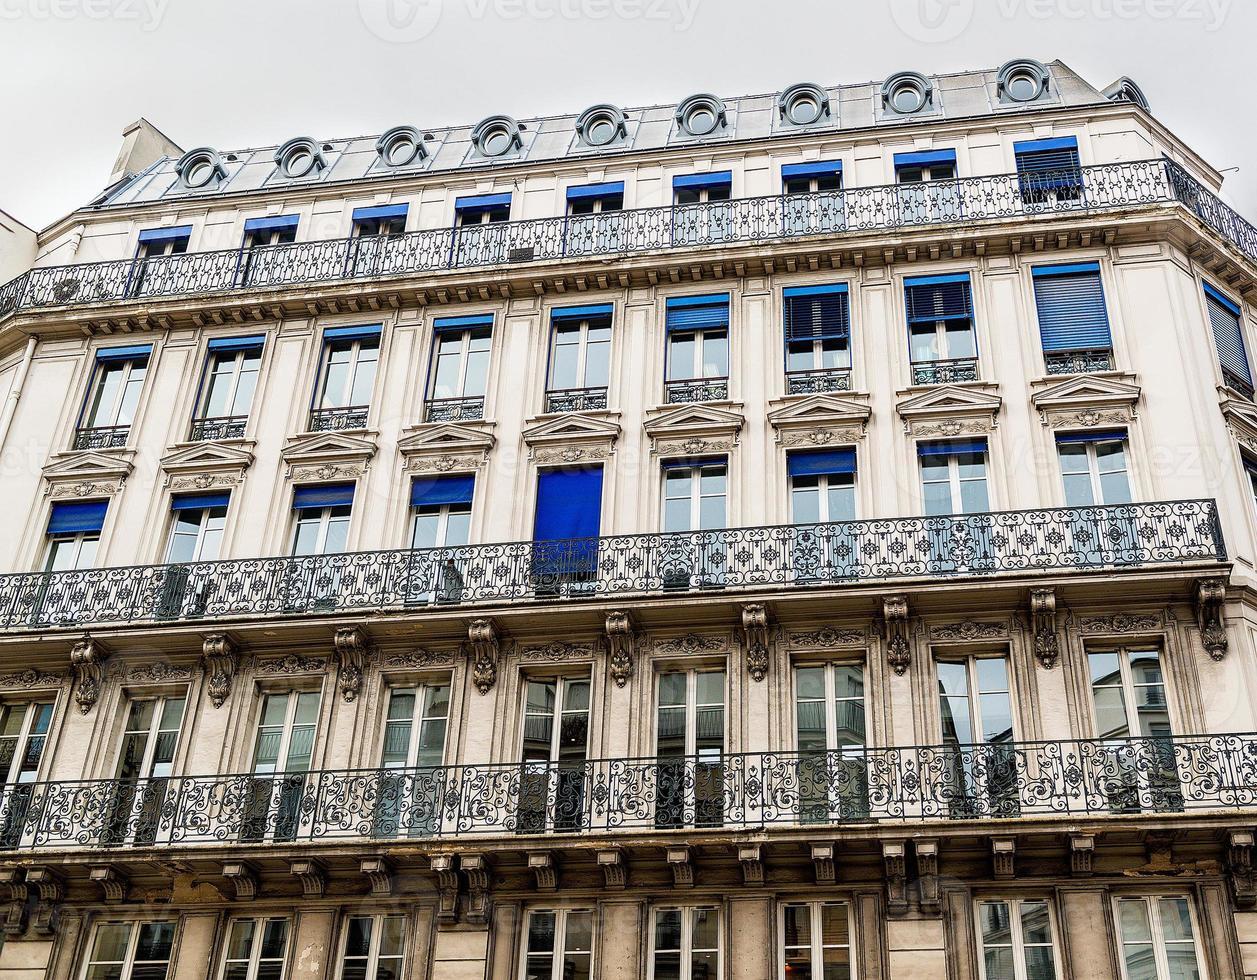 Architektur in Paris foto